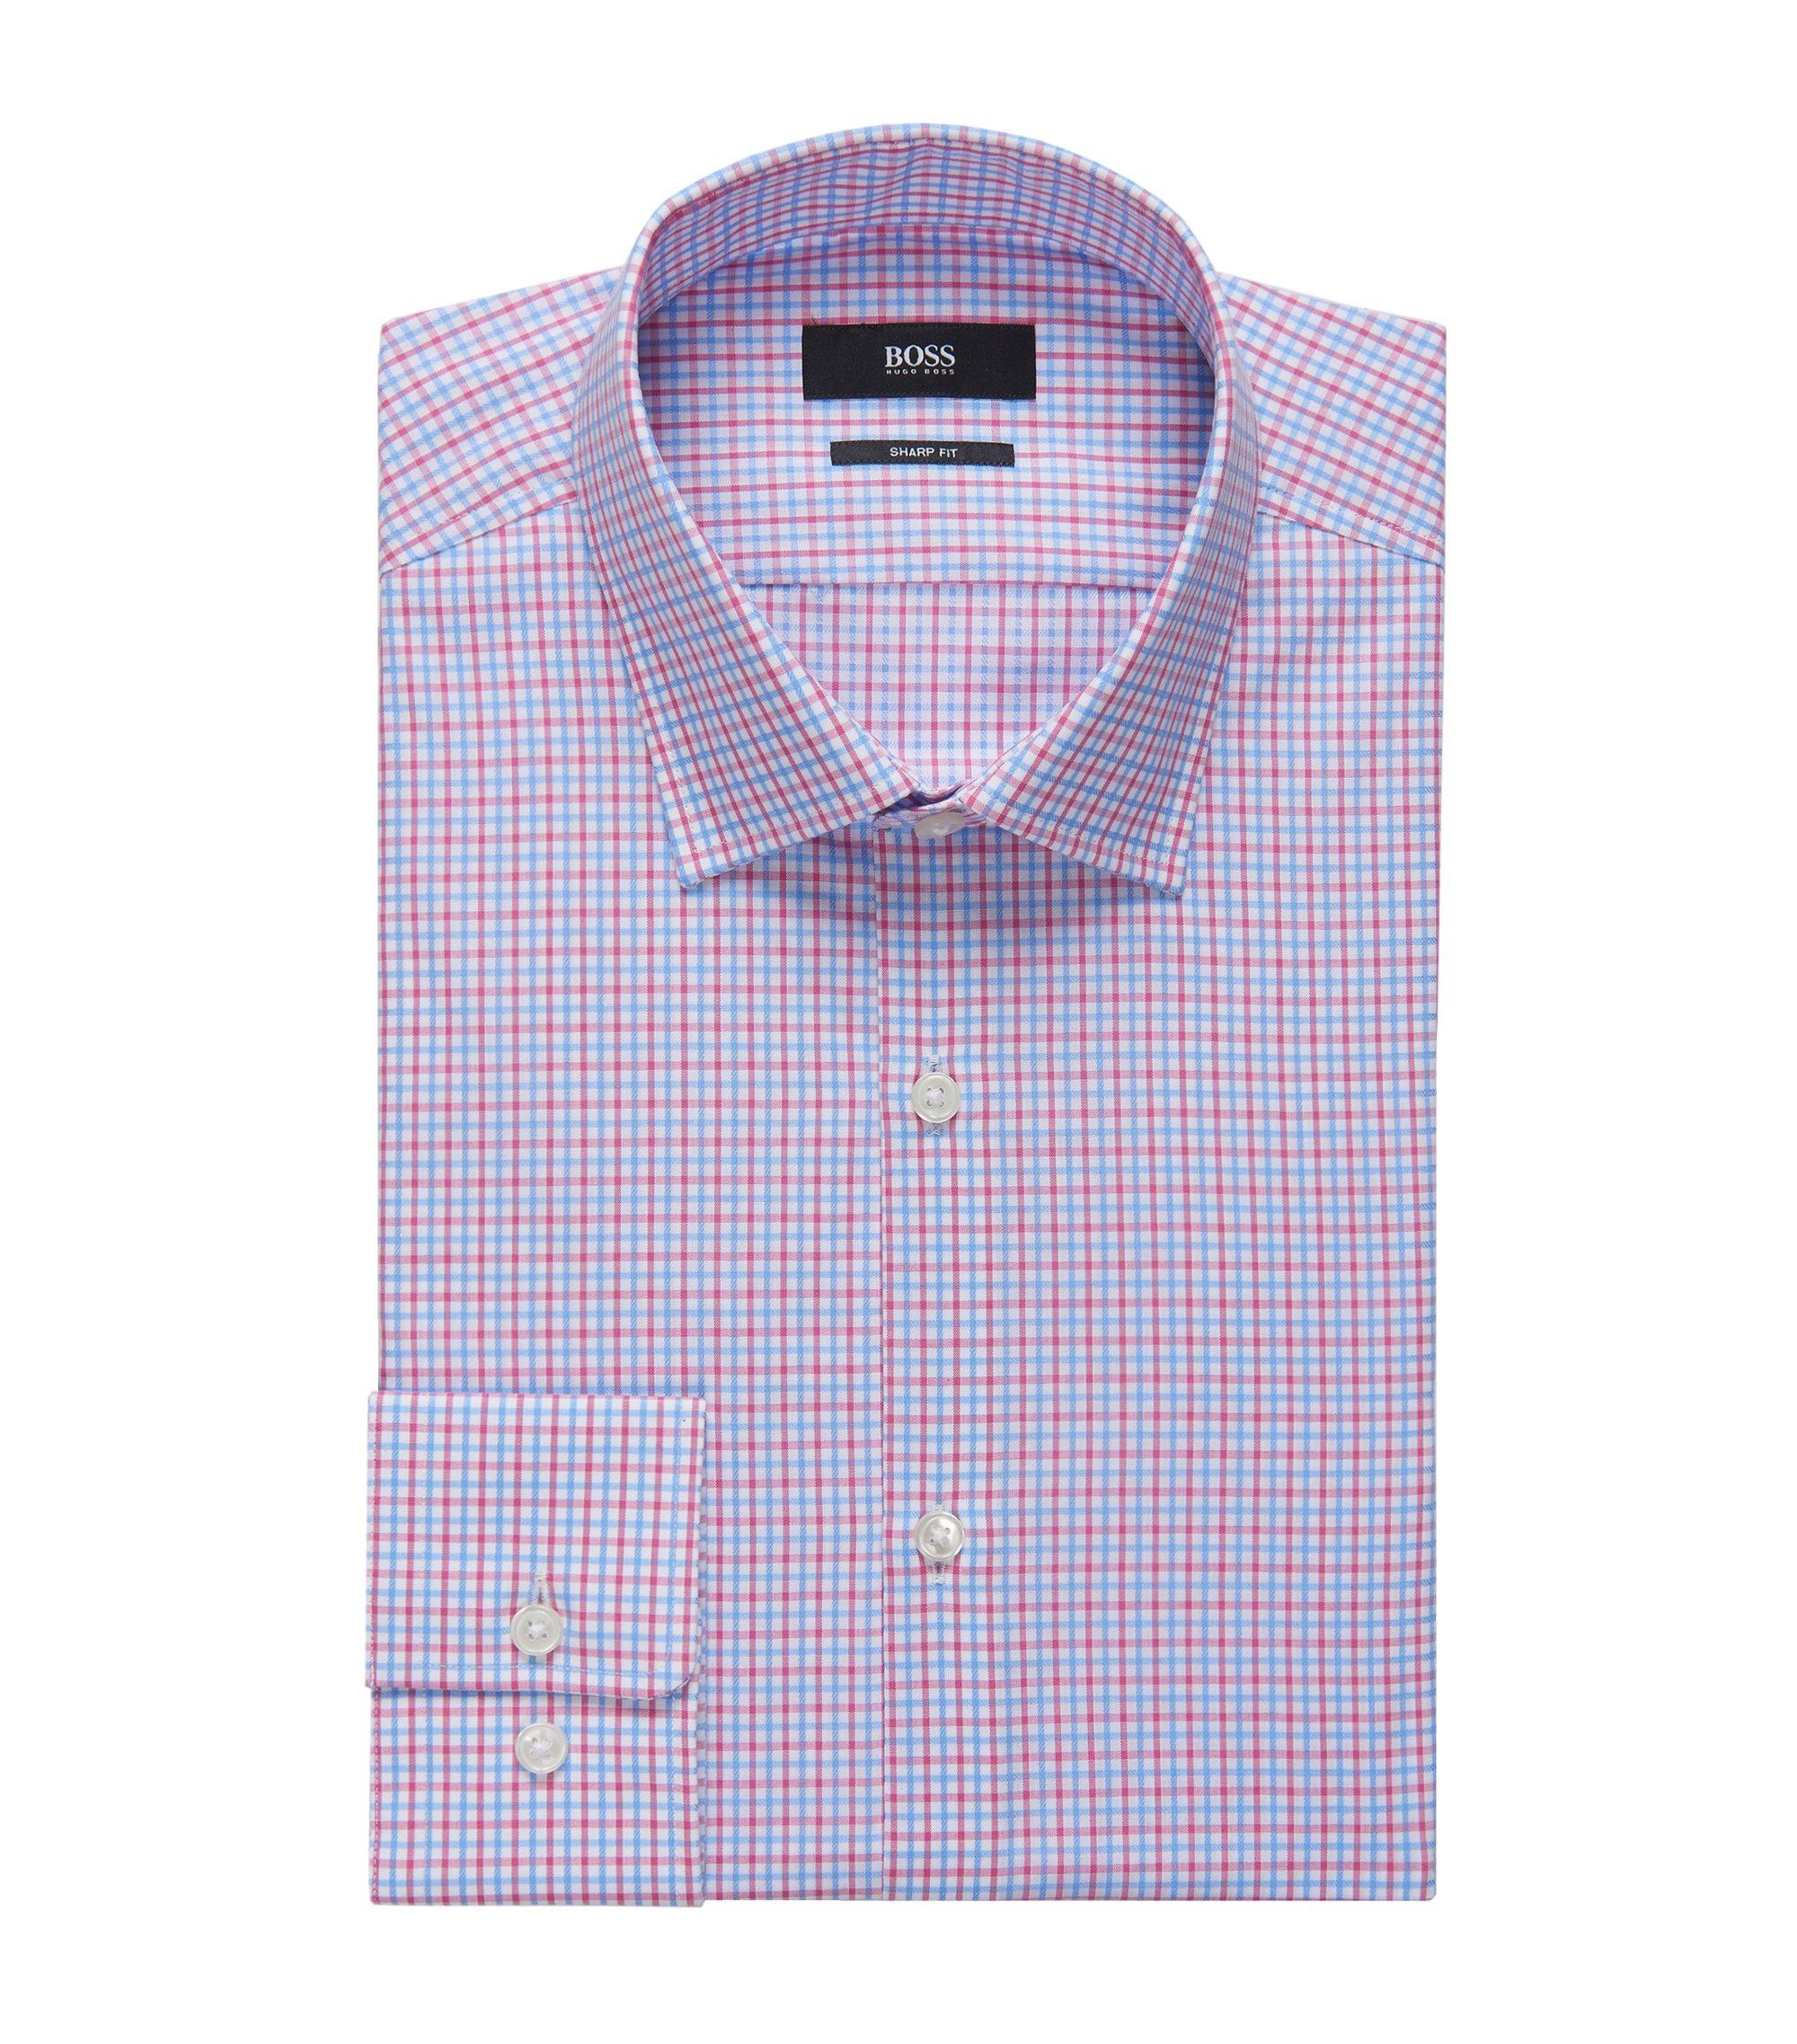 Tattersall Cotton Dress Shirt, Sharp Fit   Marley US, Pink